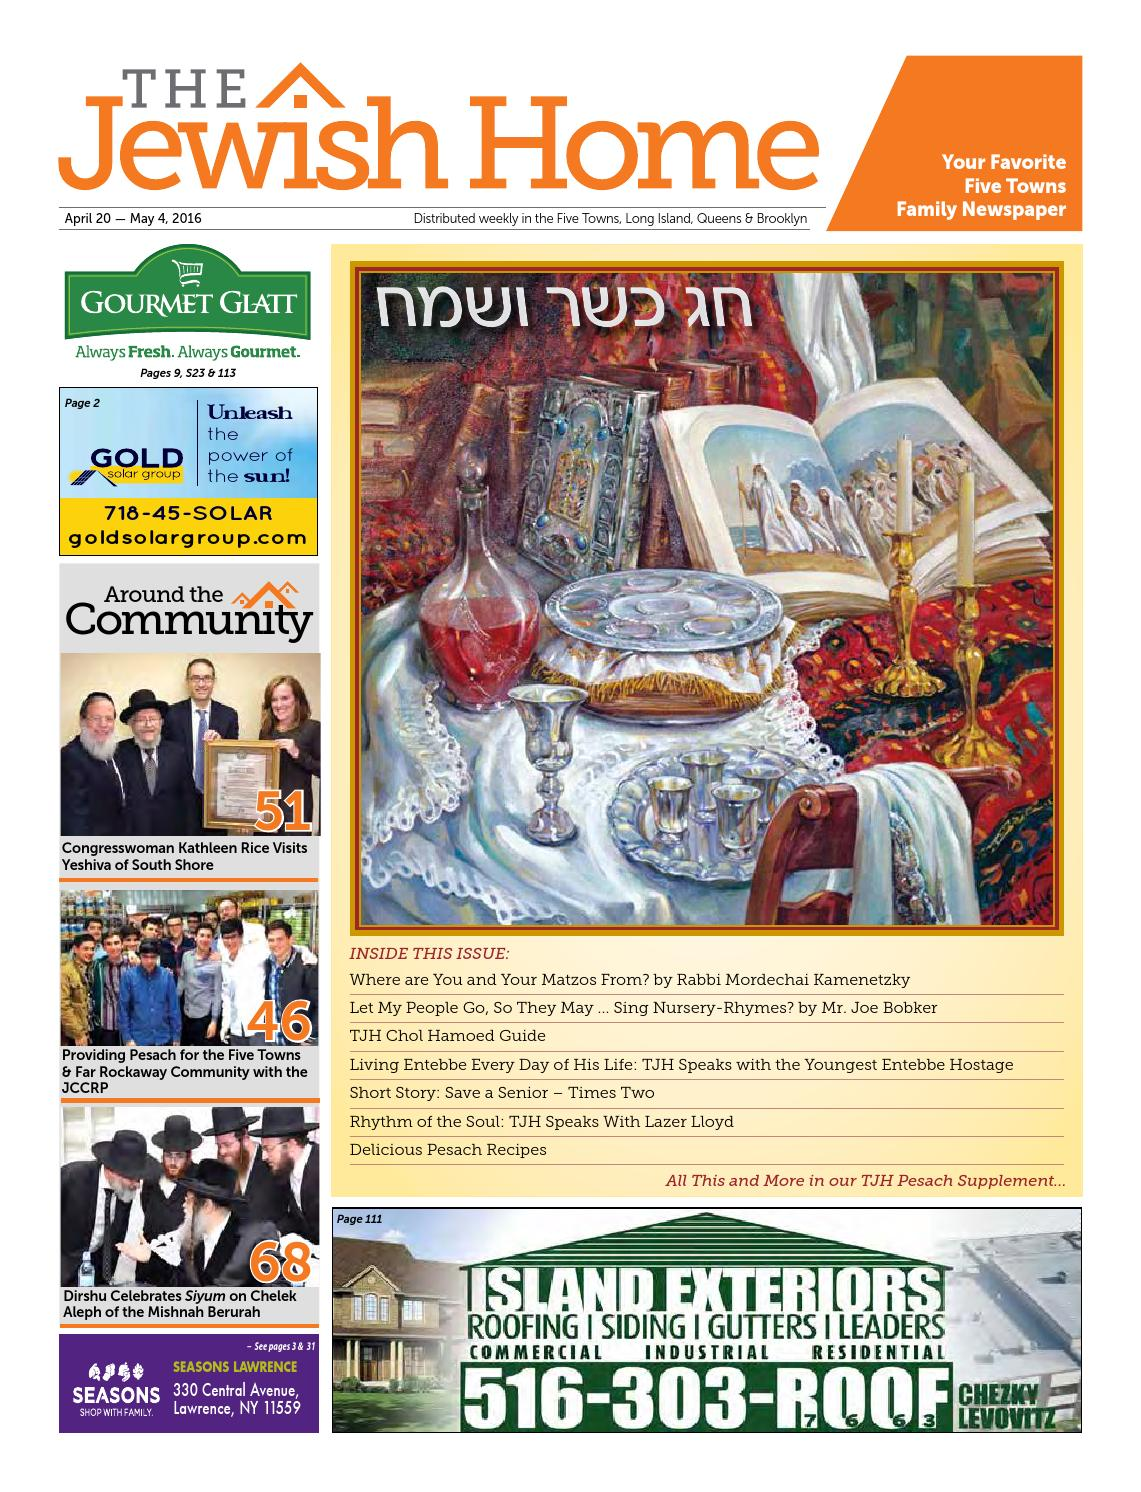 Five Towns Jewish Home - 4-20-16 by Yitzy Halpern - issuu